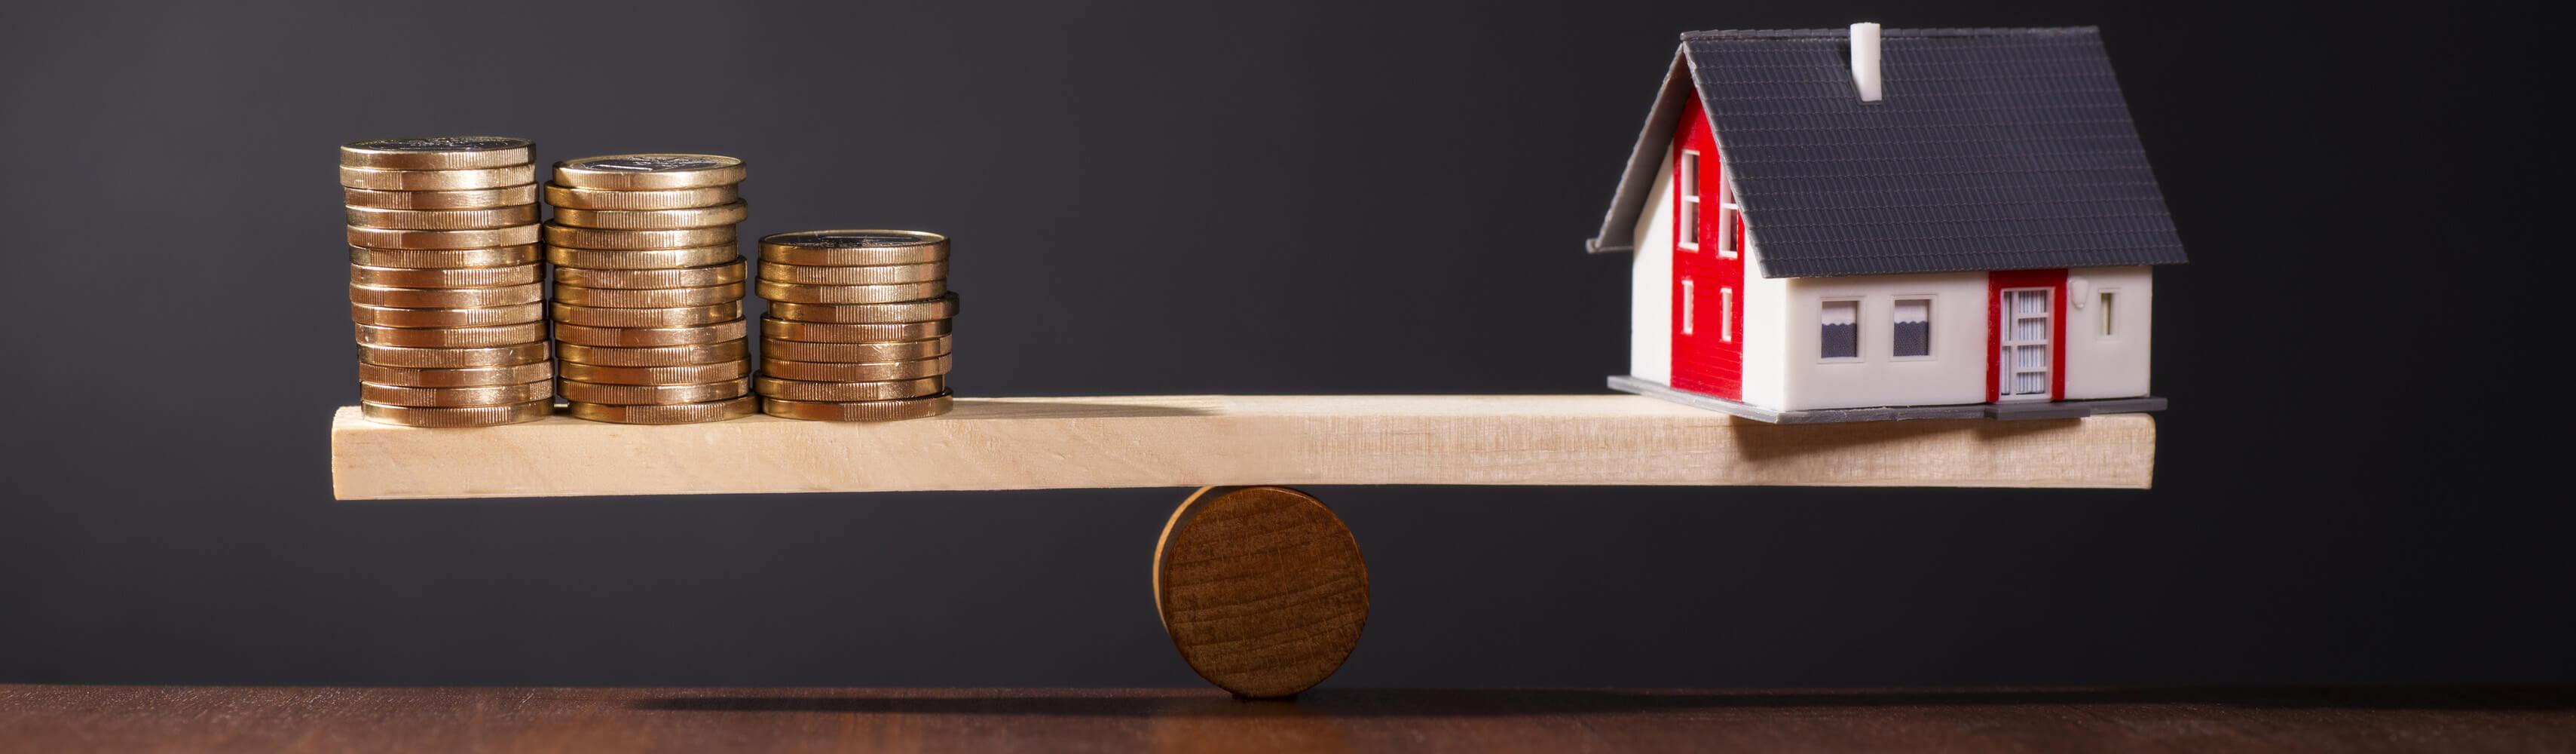 credit immobilier pret